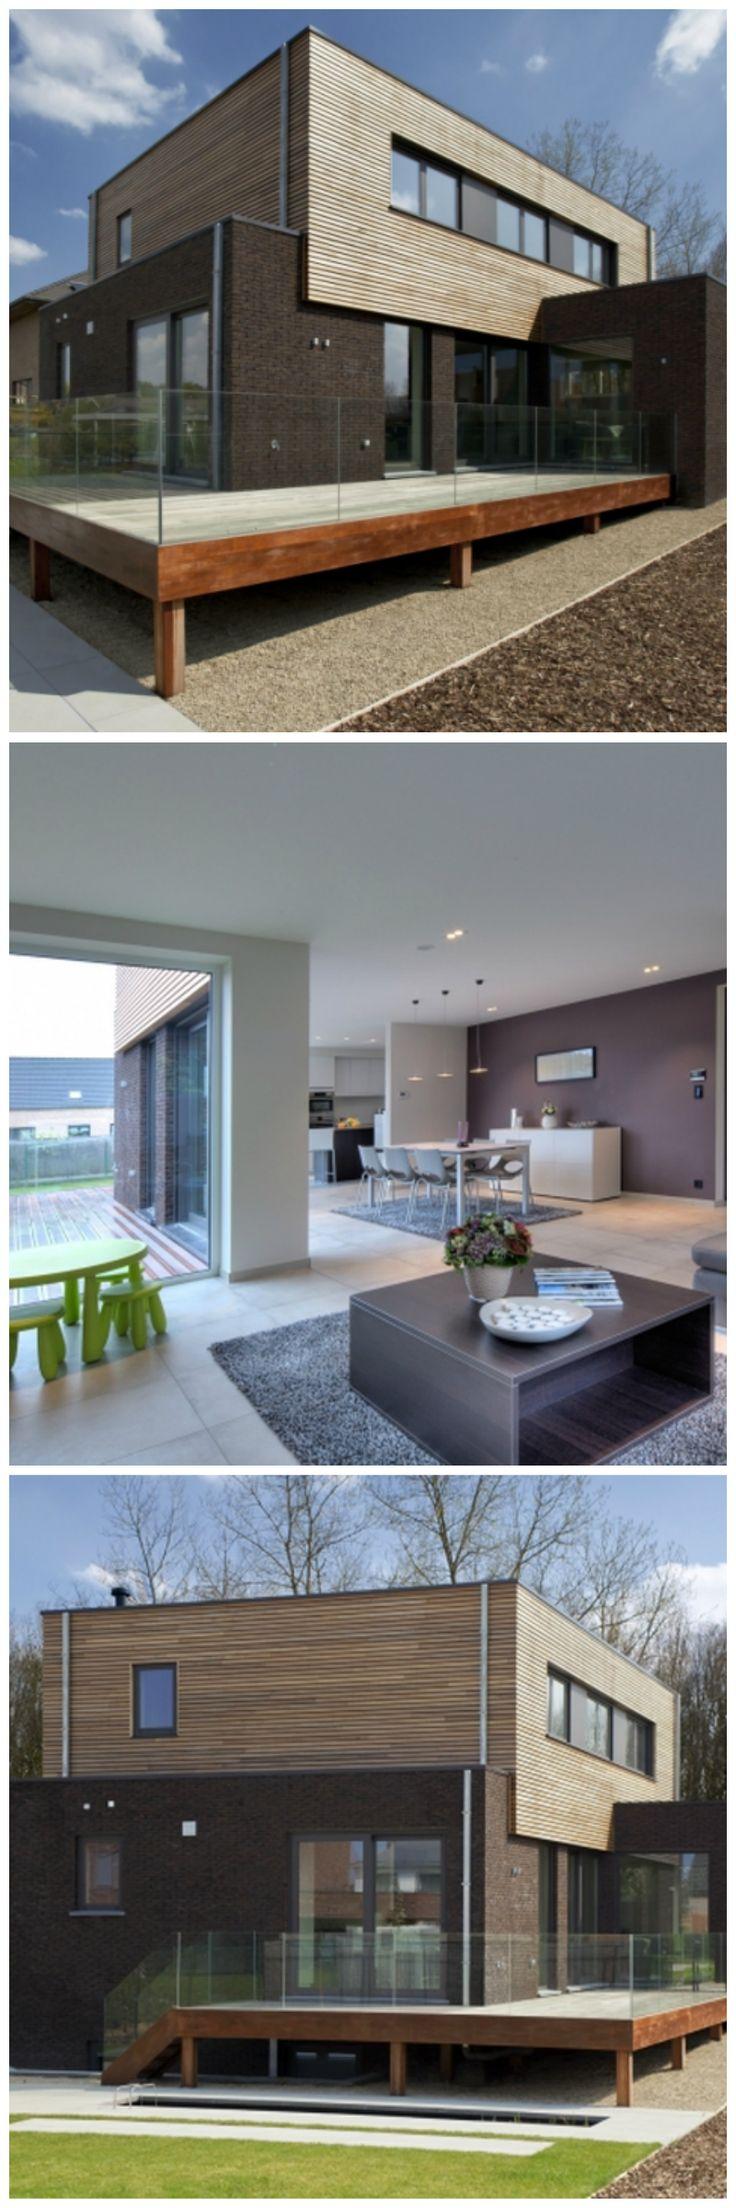 55 best nouvelle construction moderne images on pinterest modern architects and calculus. Black Bedroom Furniture Sets. Home Design Ideas